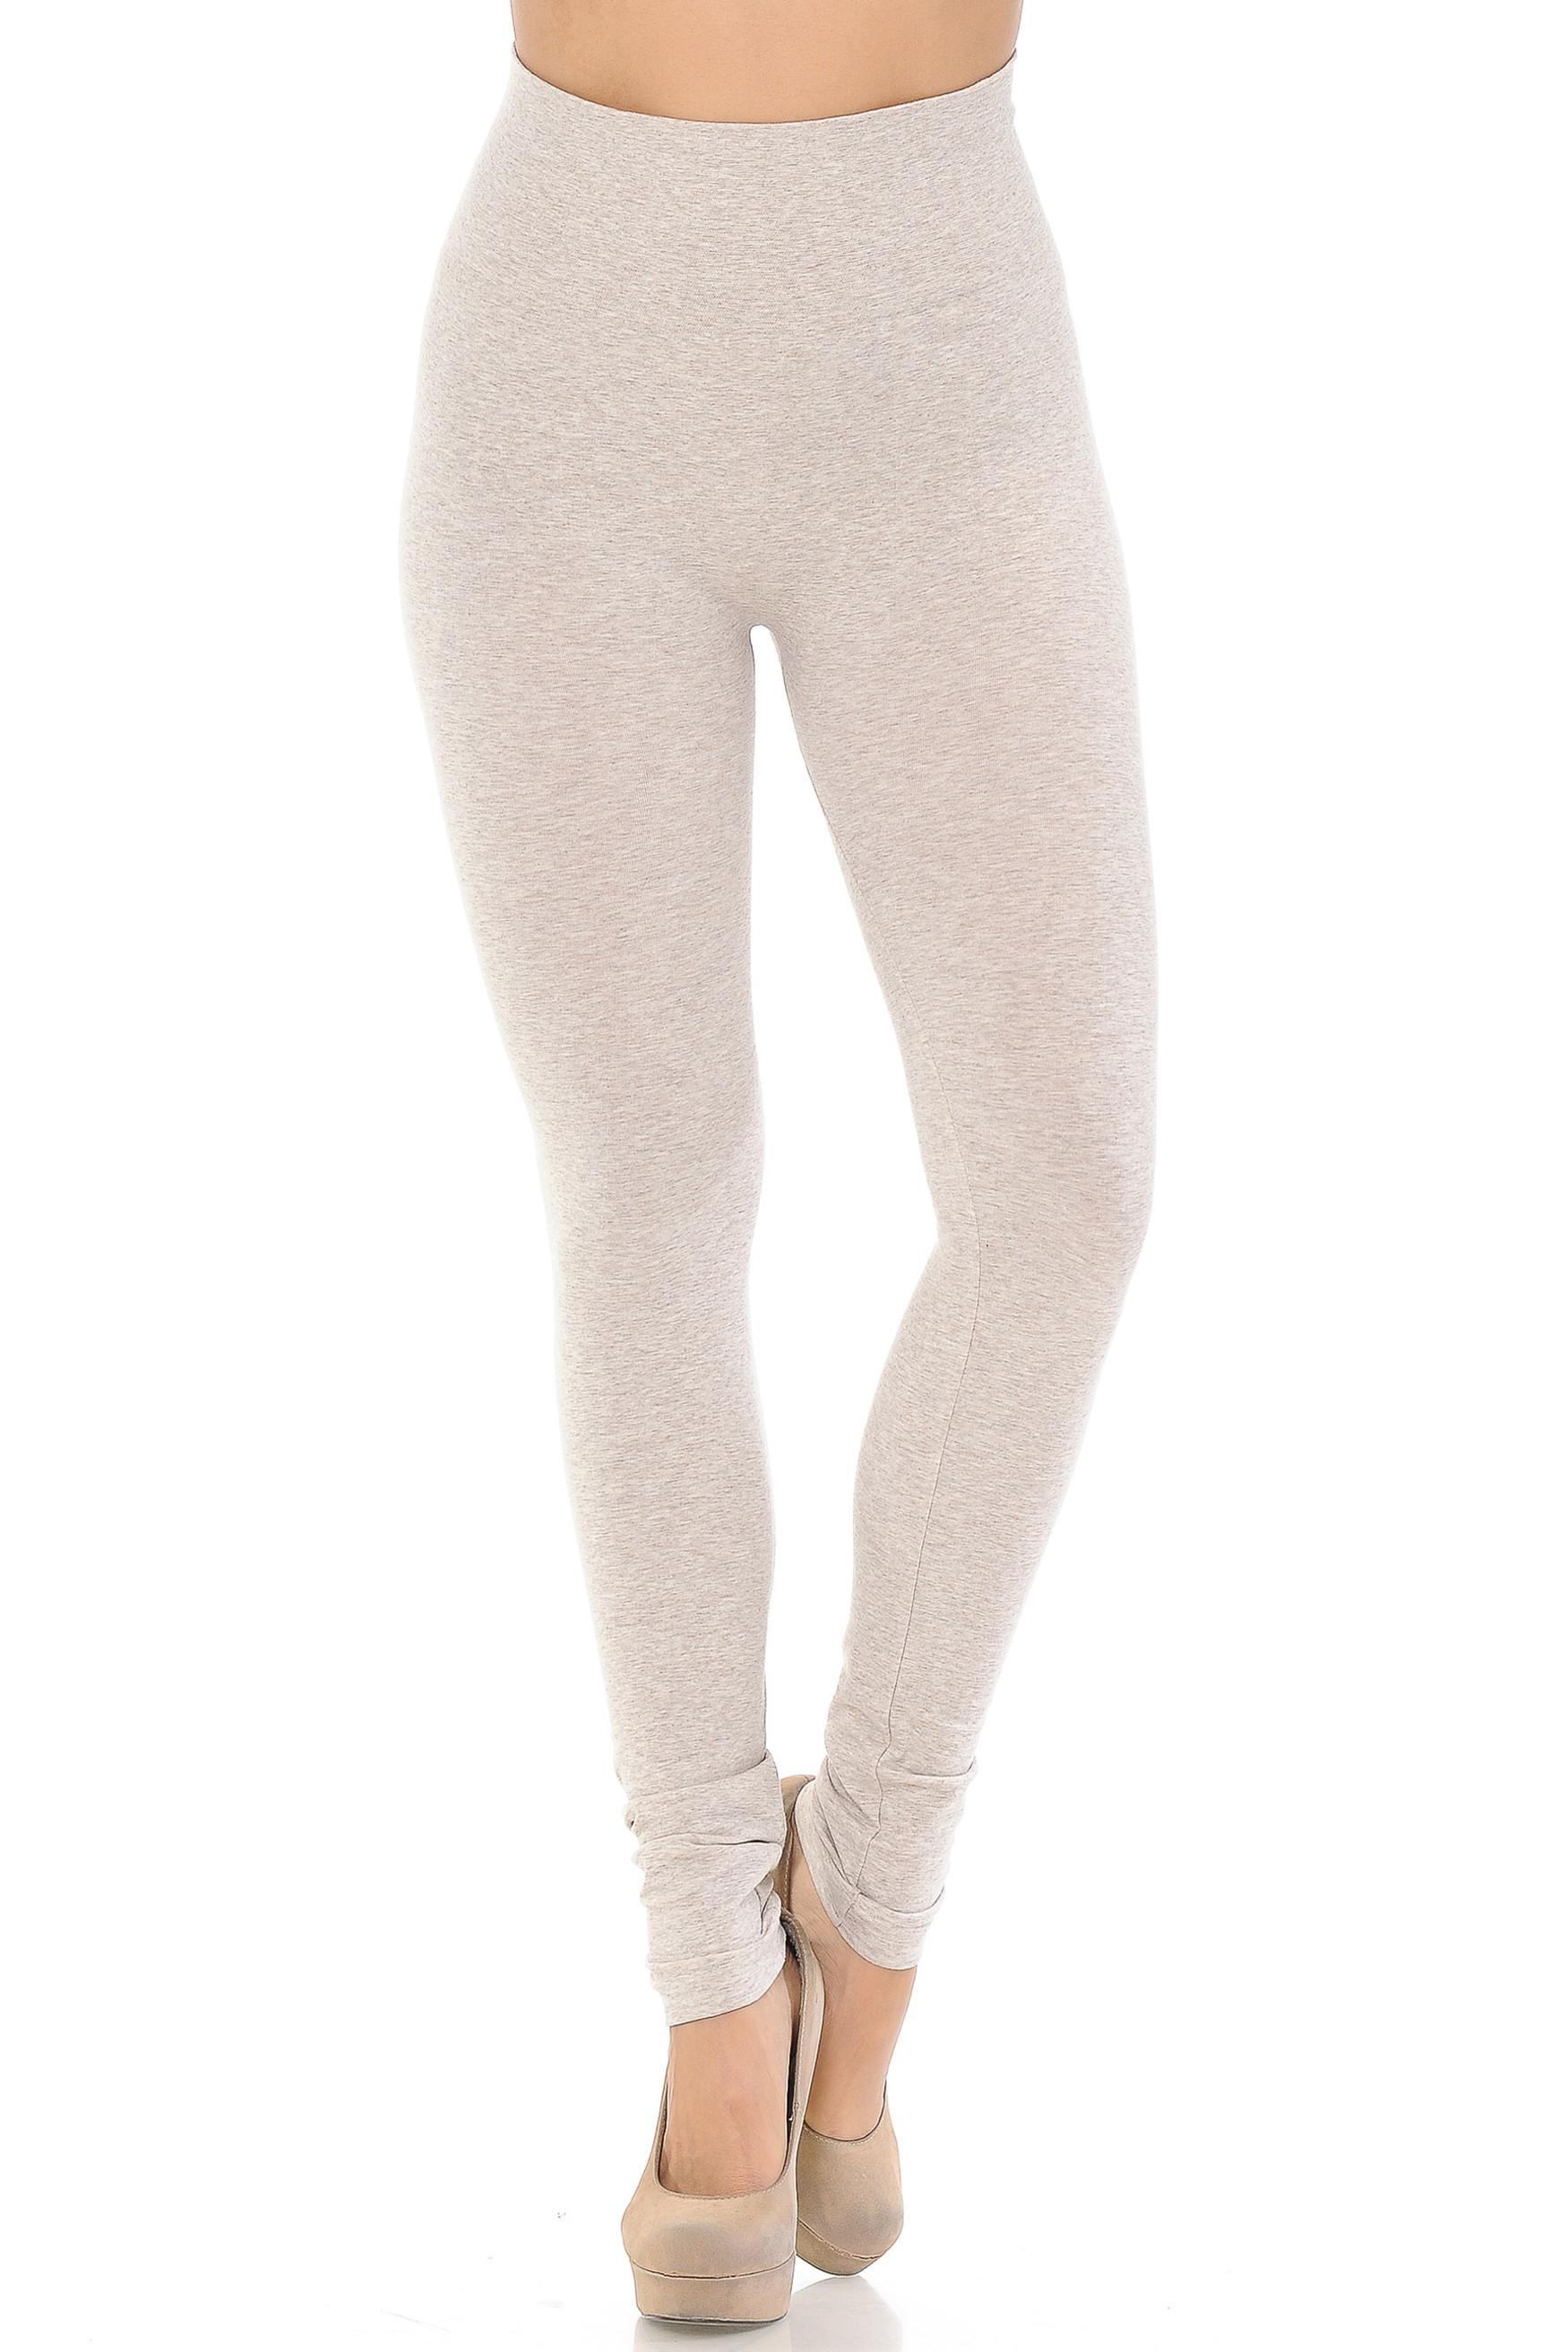 Comfy Heathered High Waisted Leggings